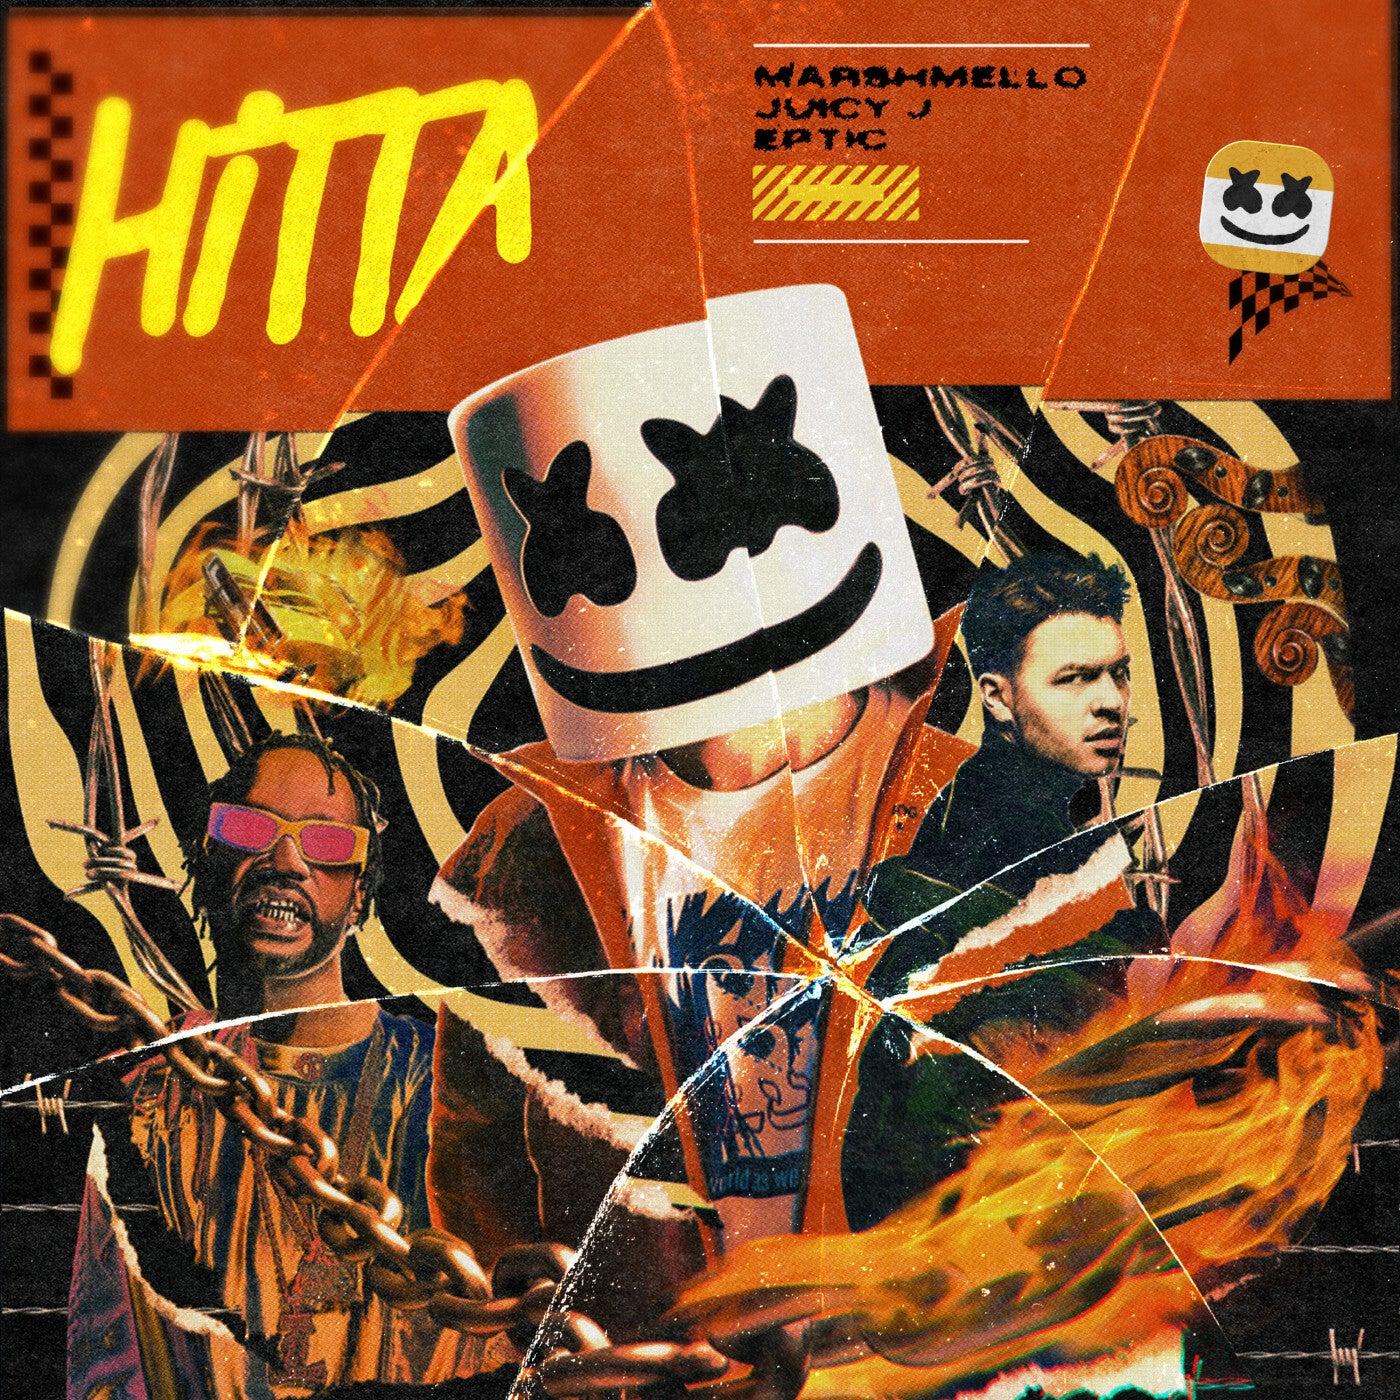 Hitta (feat. Juicy J) (Original Mix)